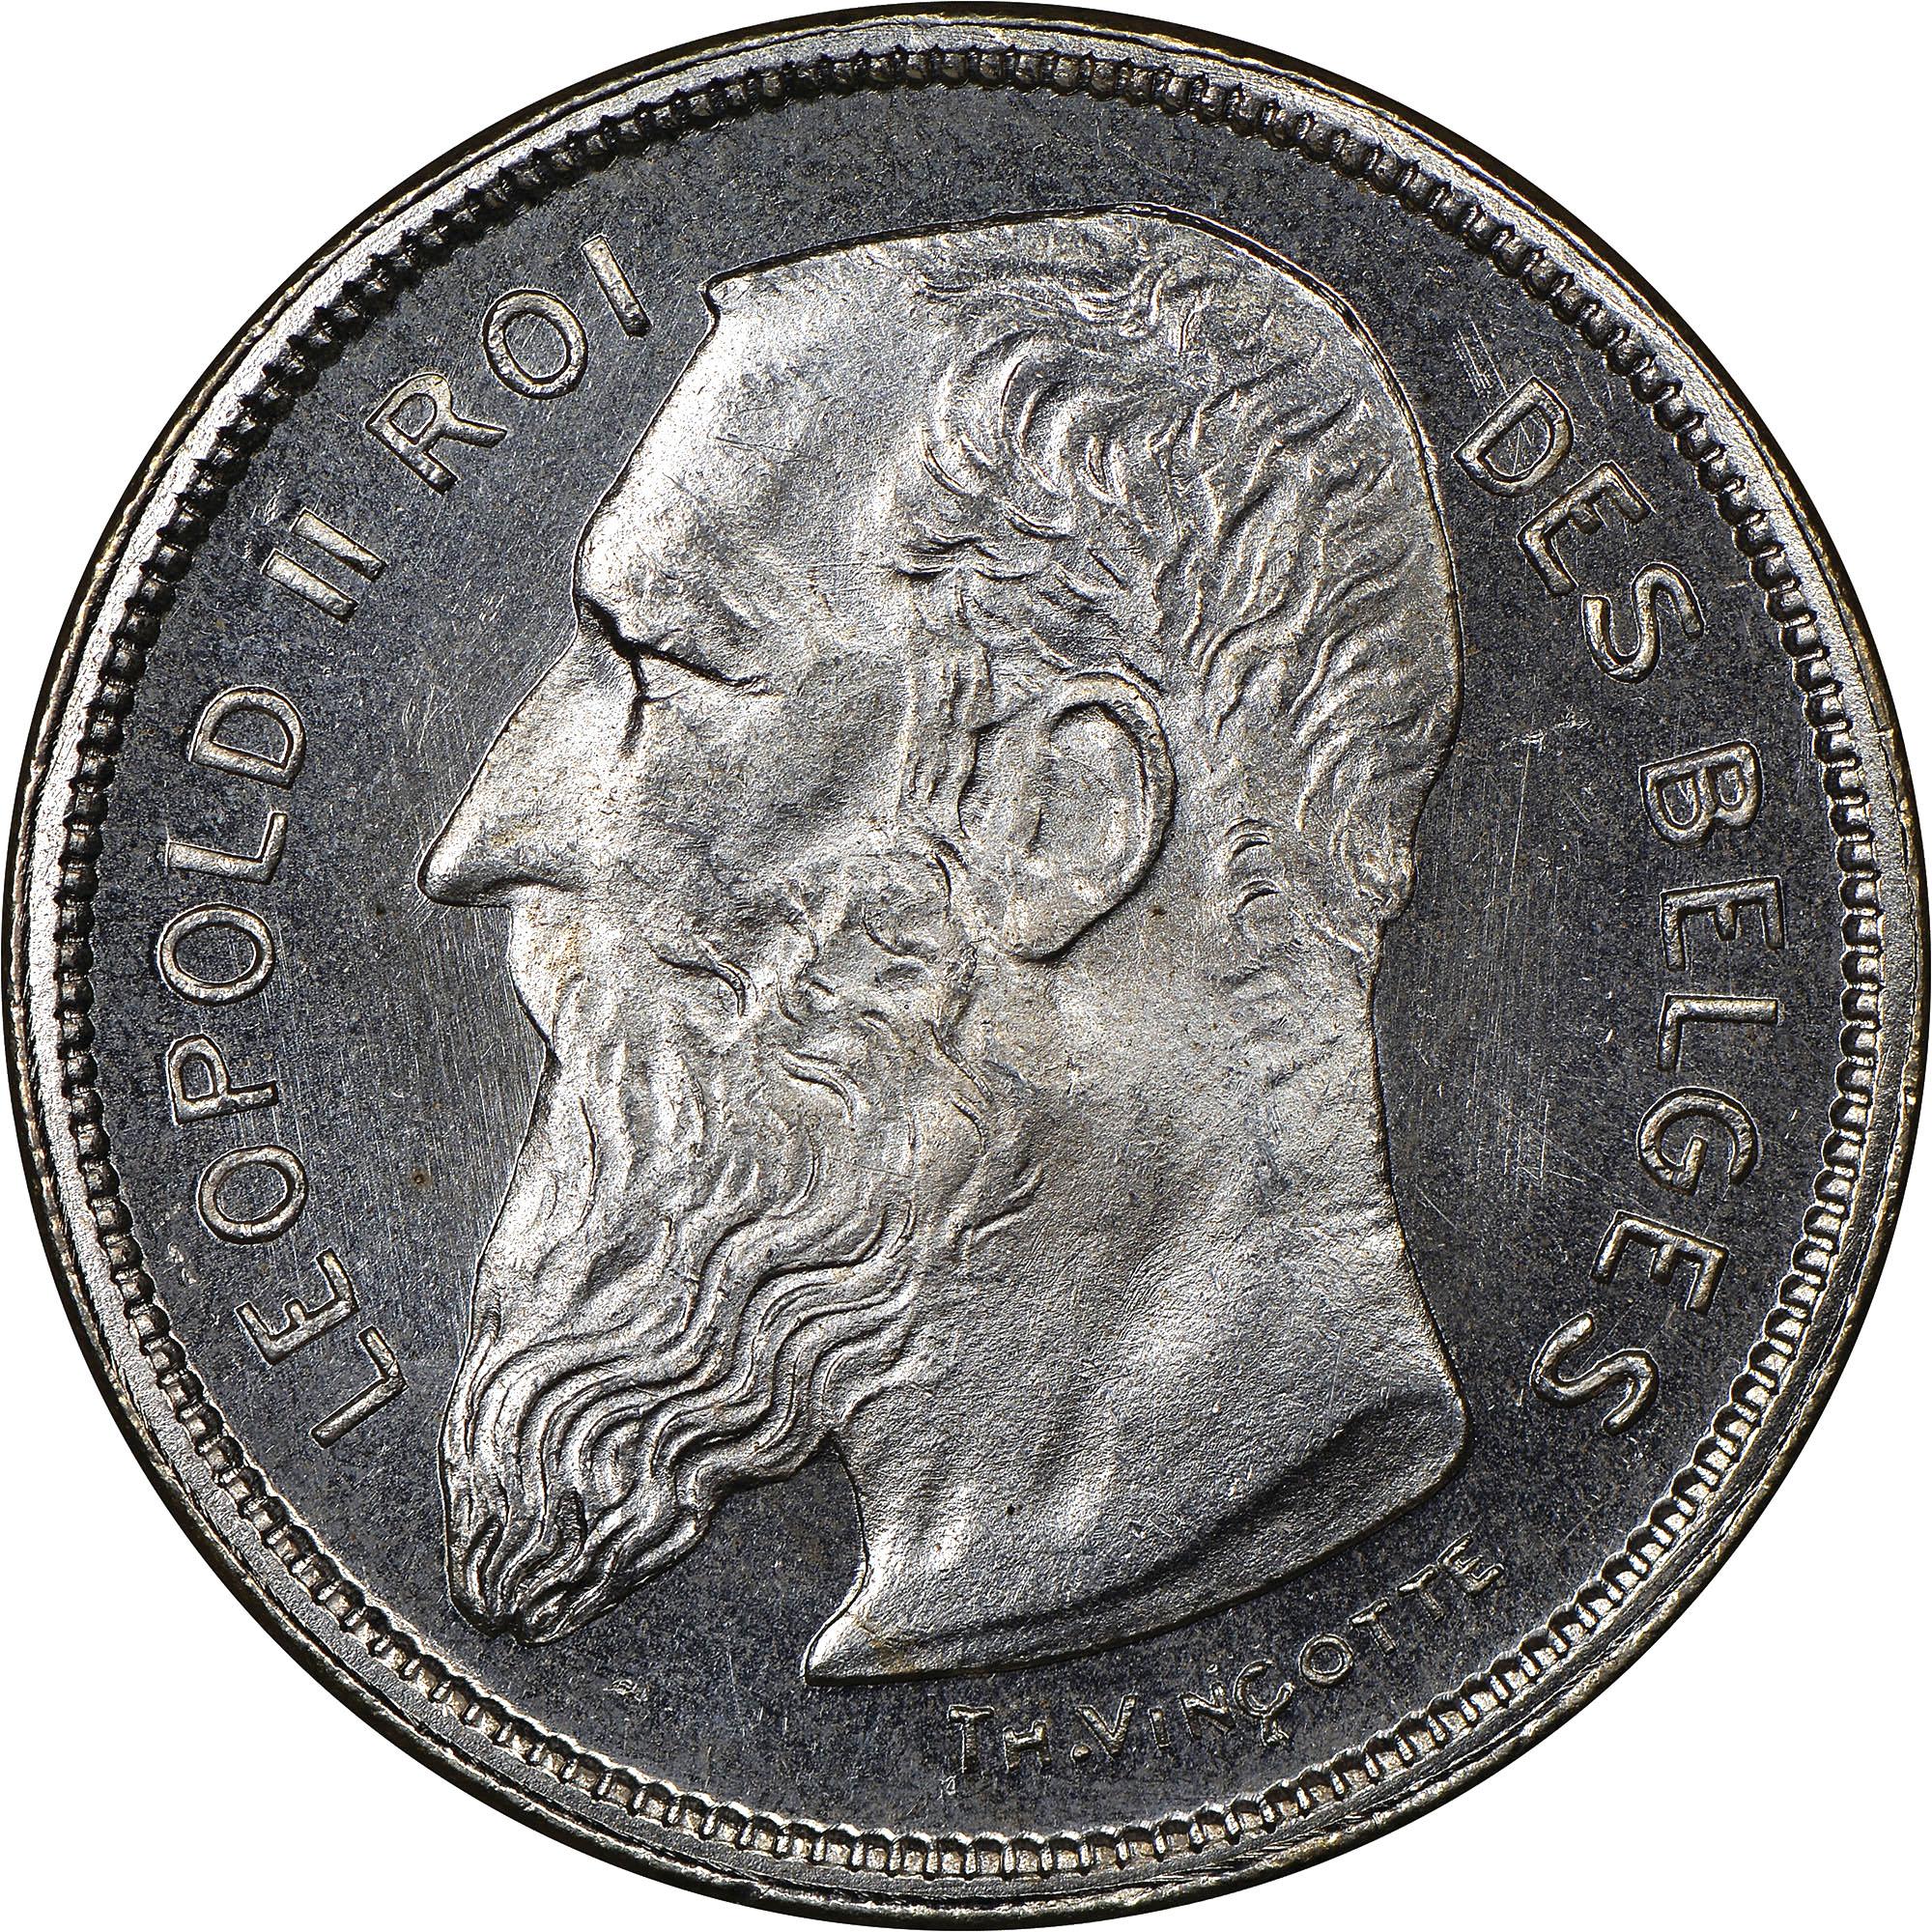 Belgium 2 Francs obverse